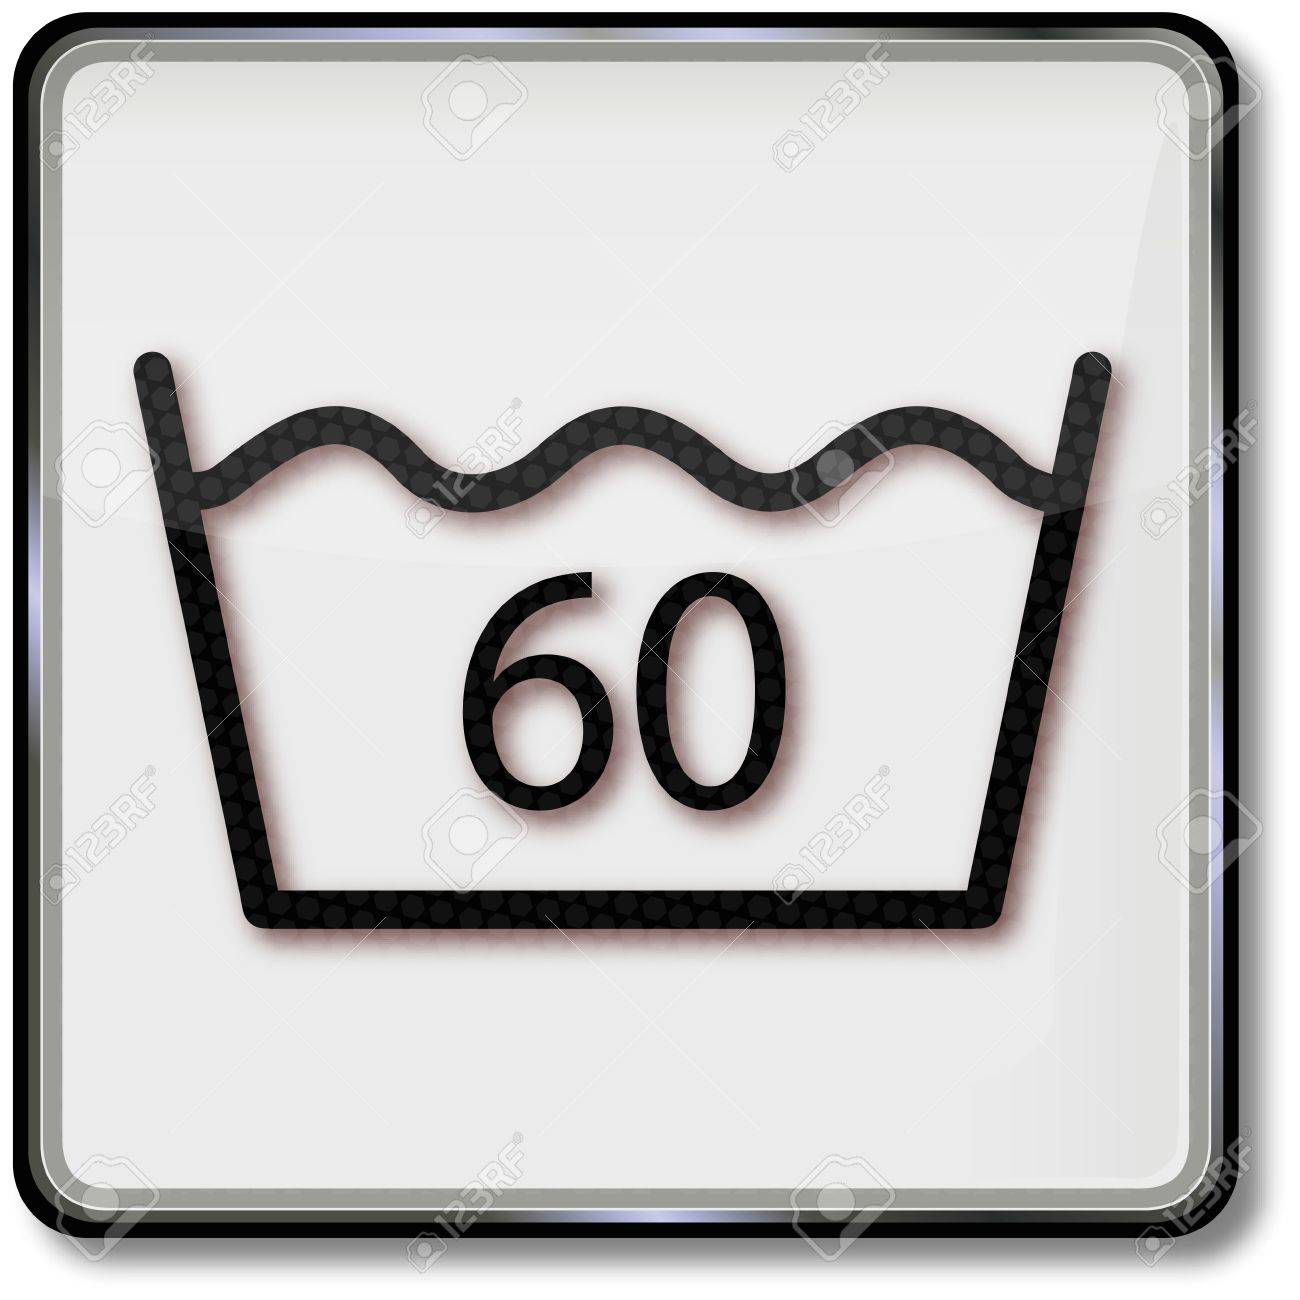 Textile care symbol wash 60 degrees Stock Vector - 14981852